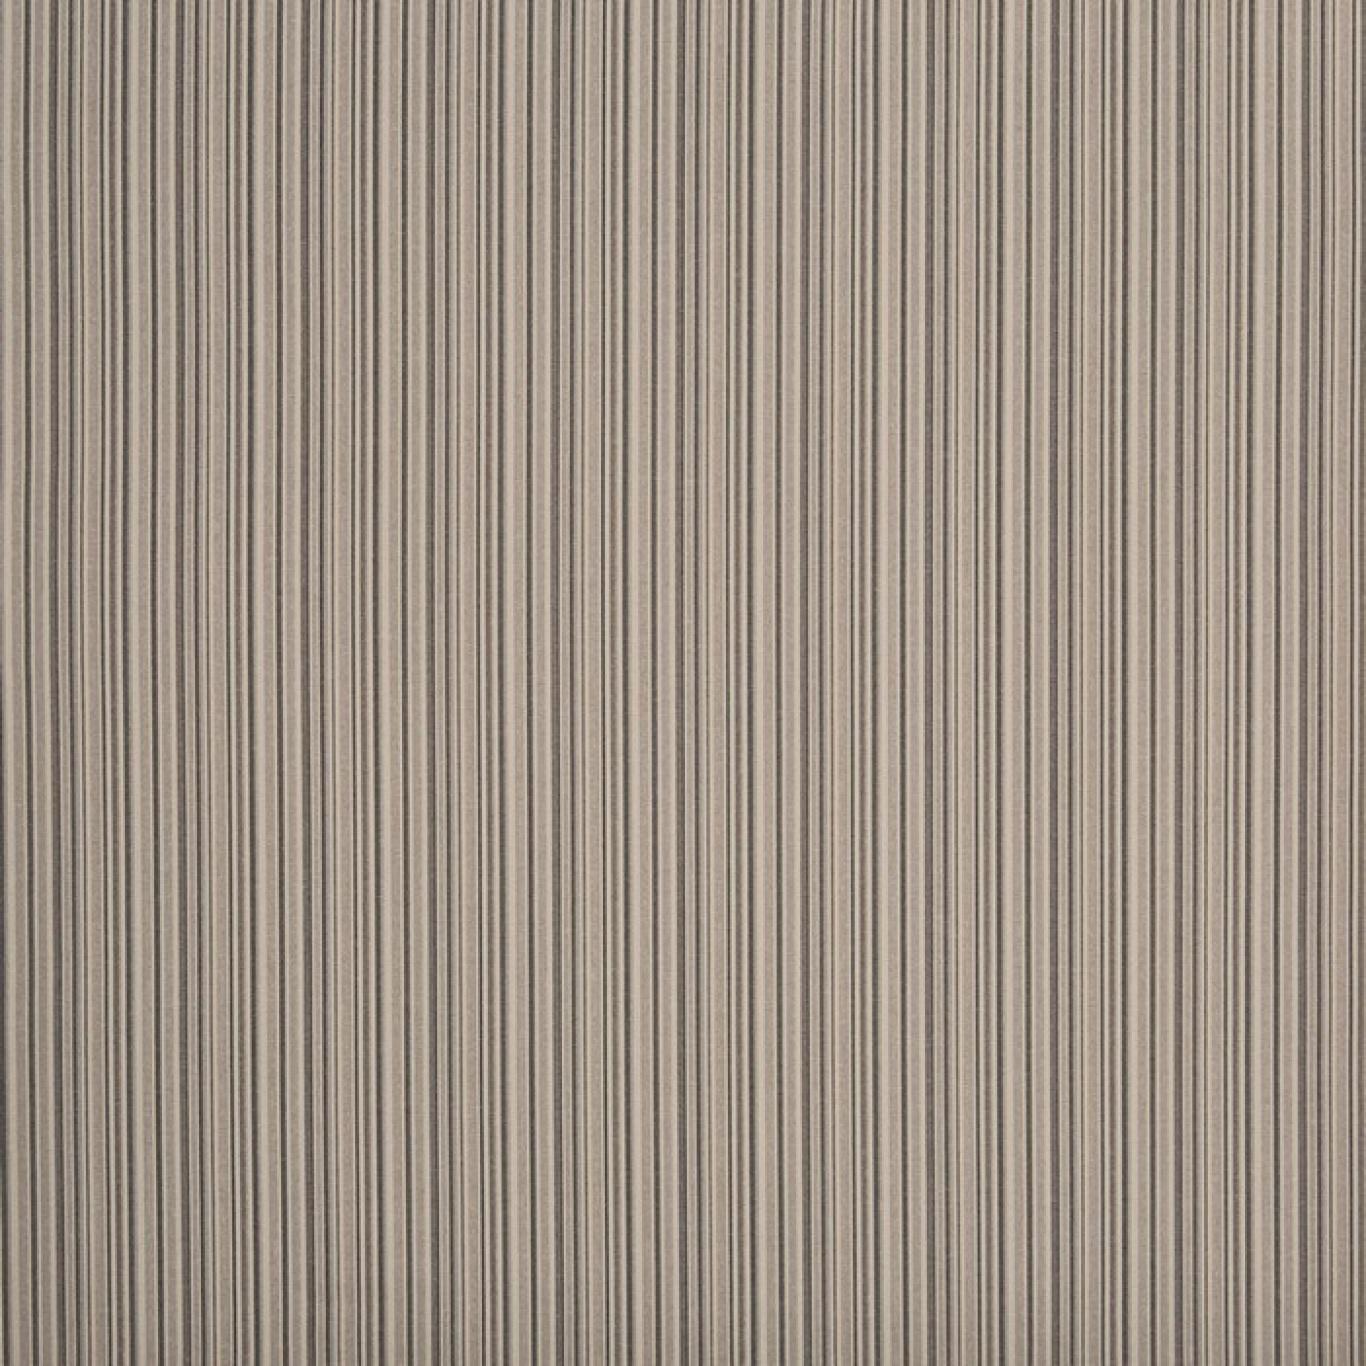 Image of Prestigious Langley Stone FR Fabric 2018/531